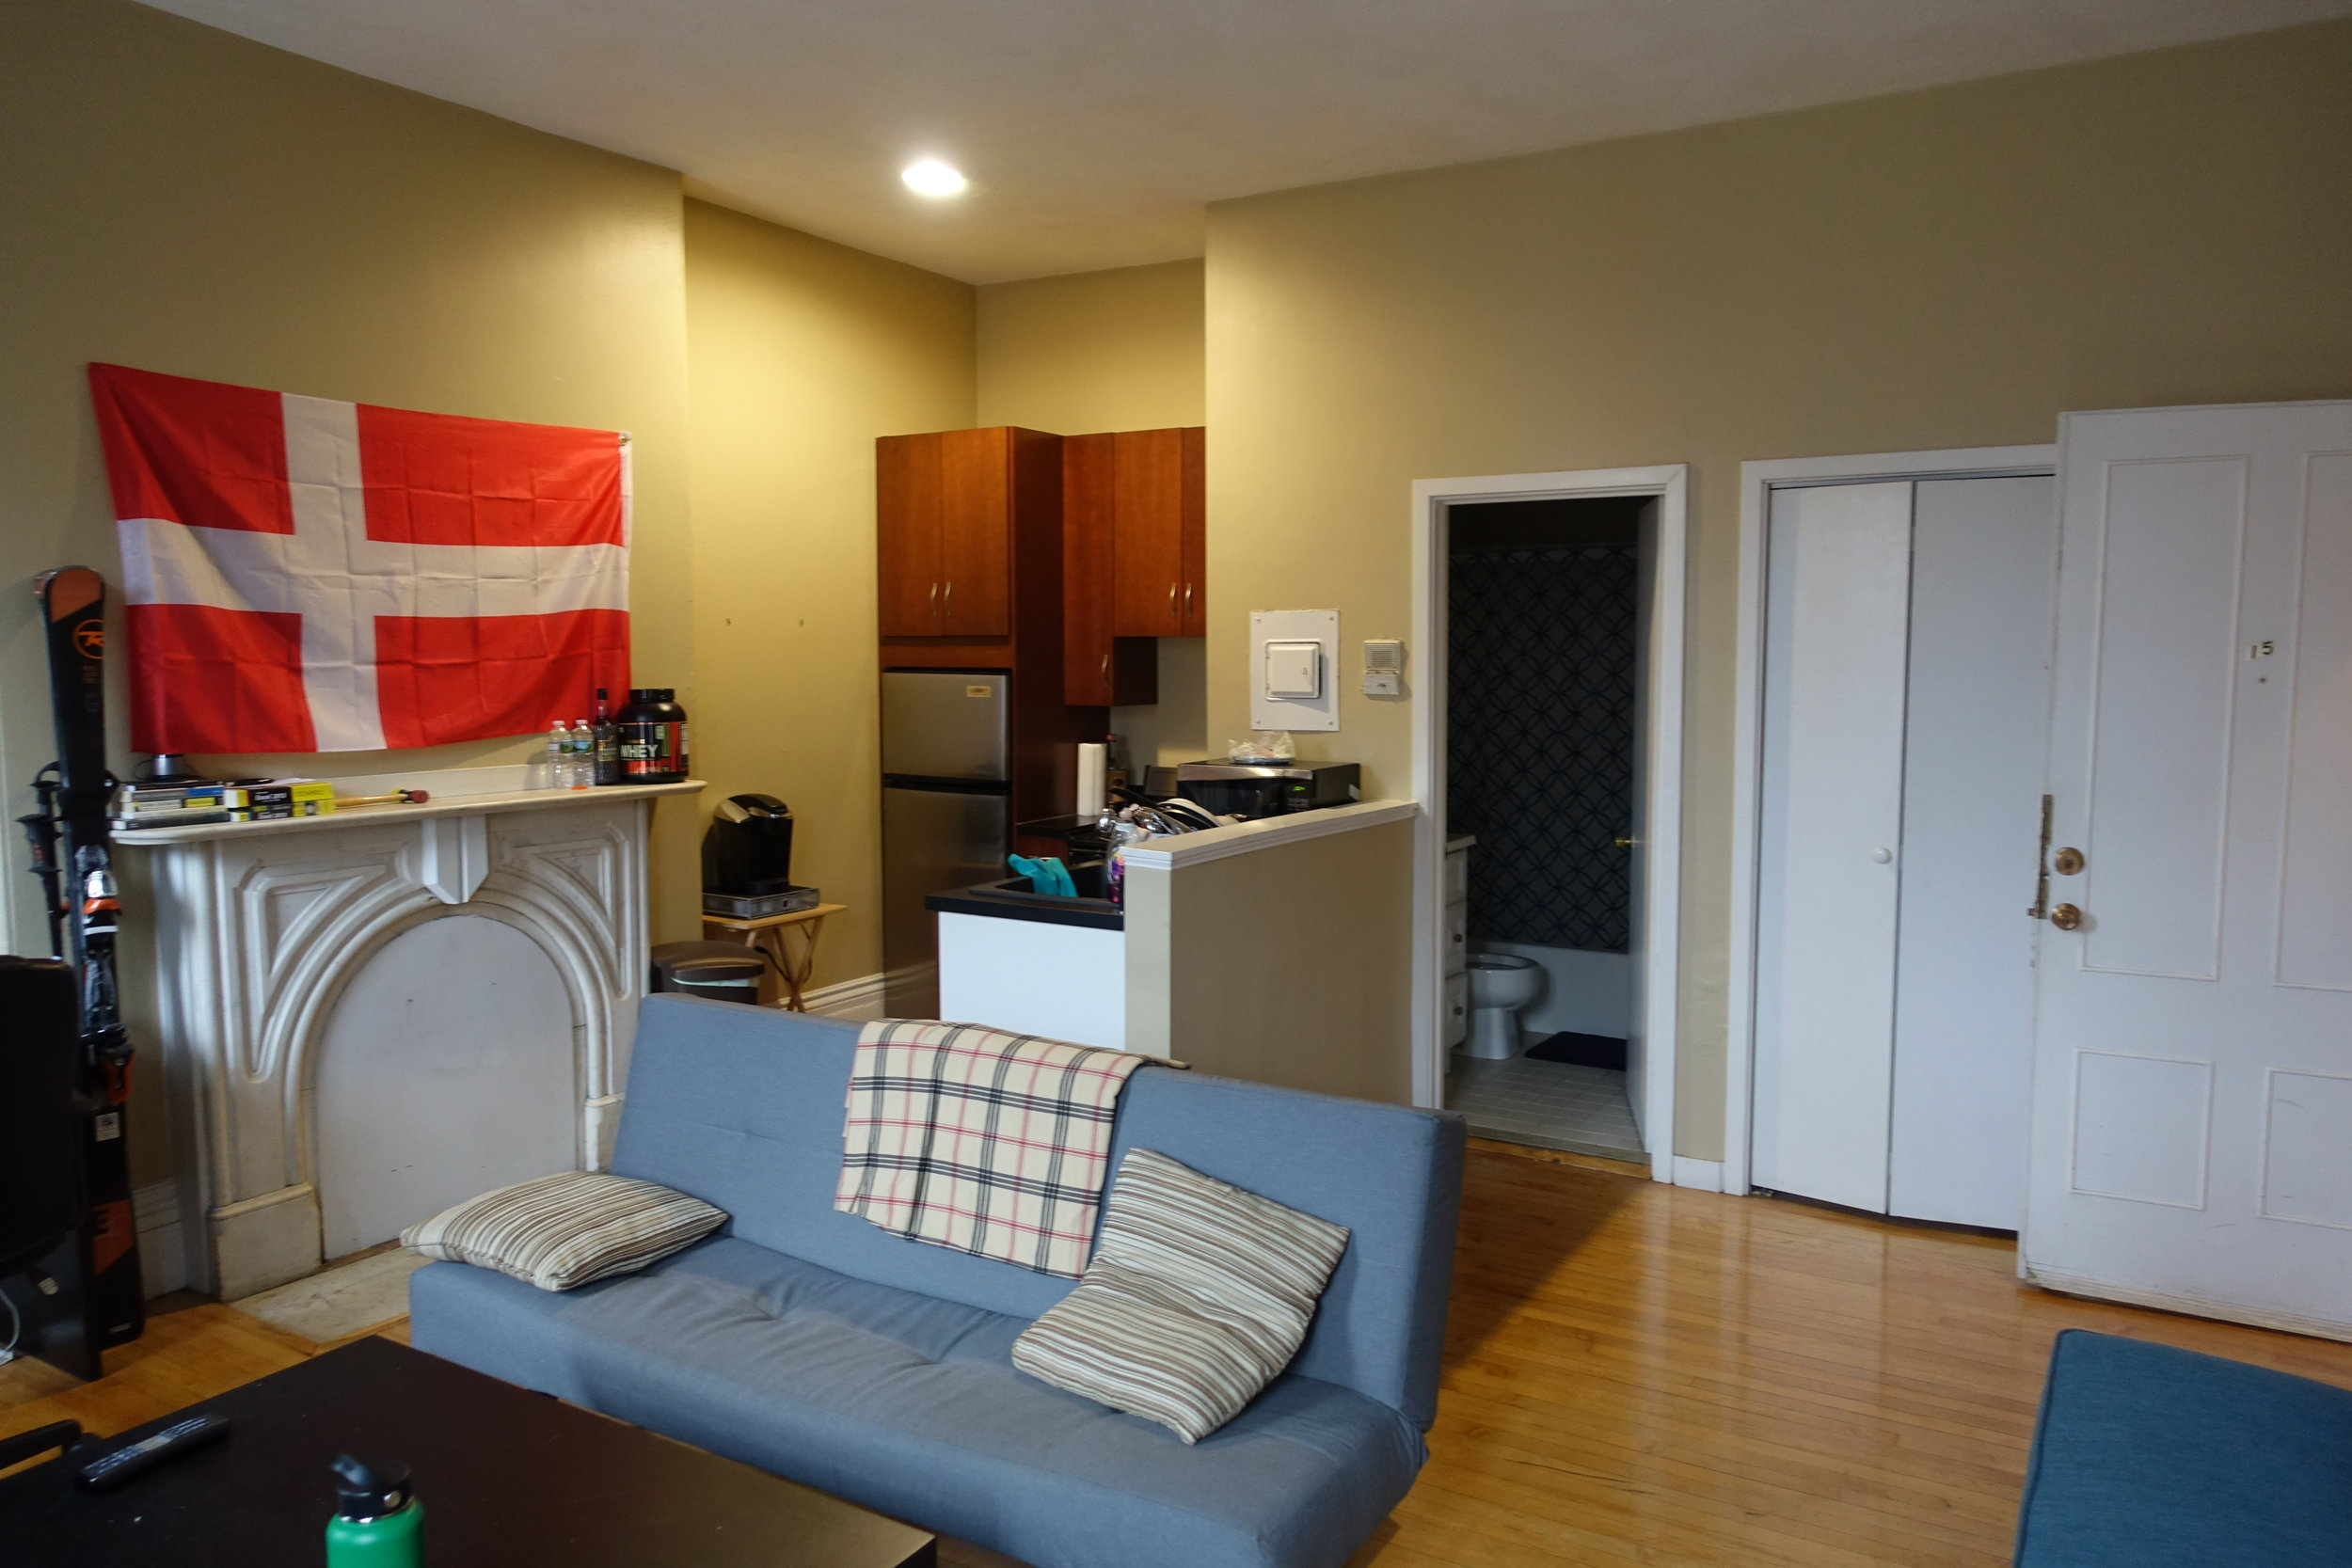 sold - 701-703 massachusetts ave. - unit 15 - south end, boston - 1 bed 1 bath - b.star